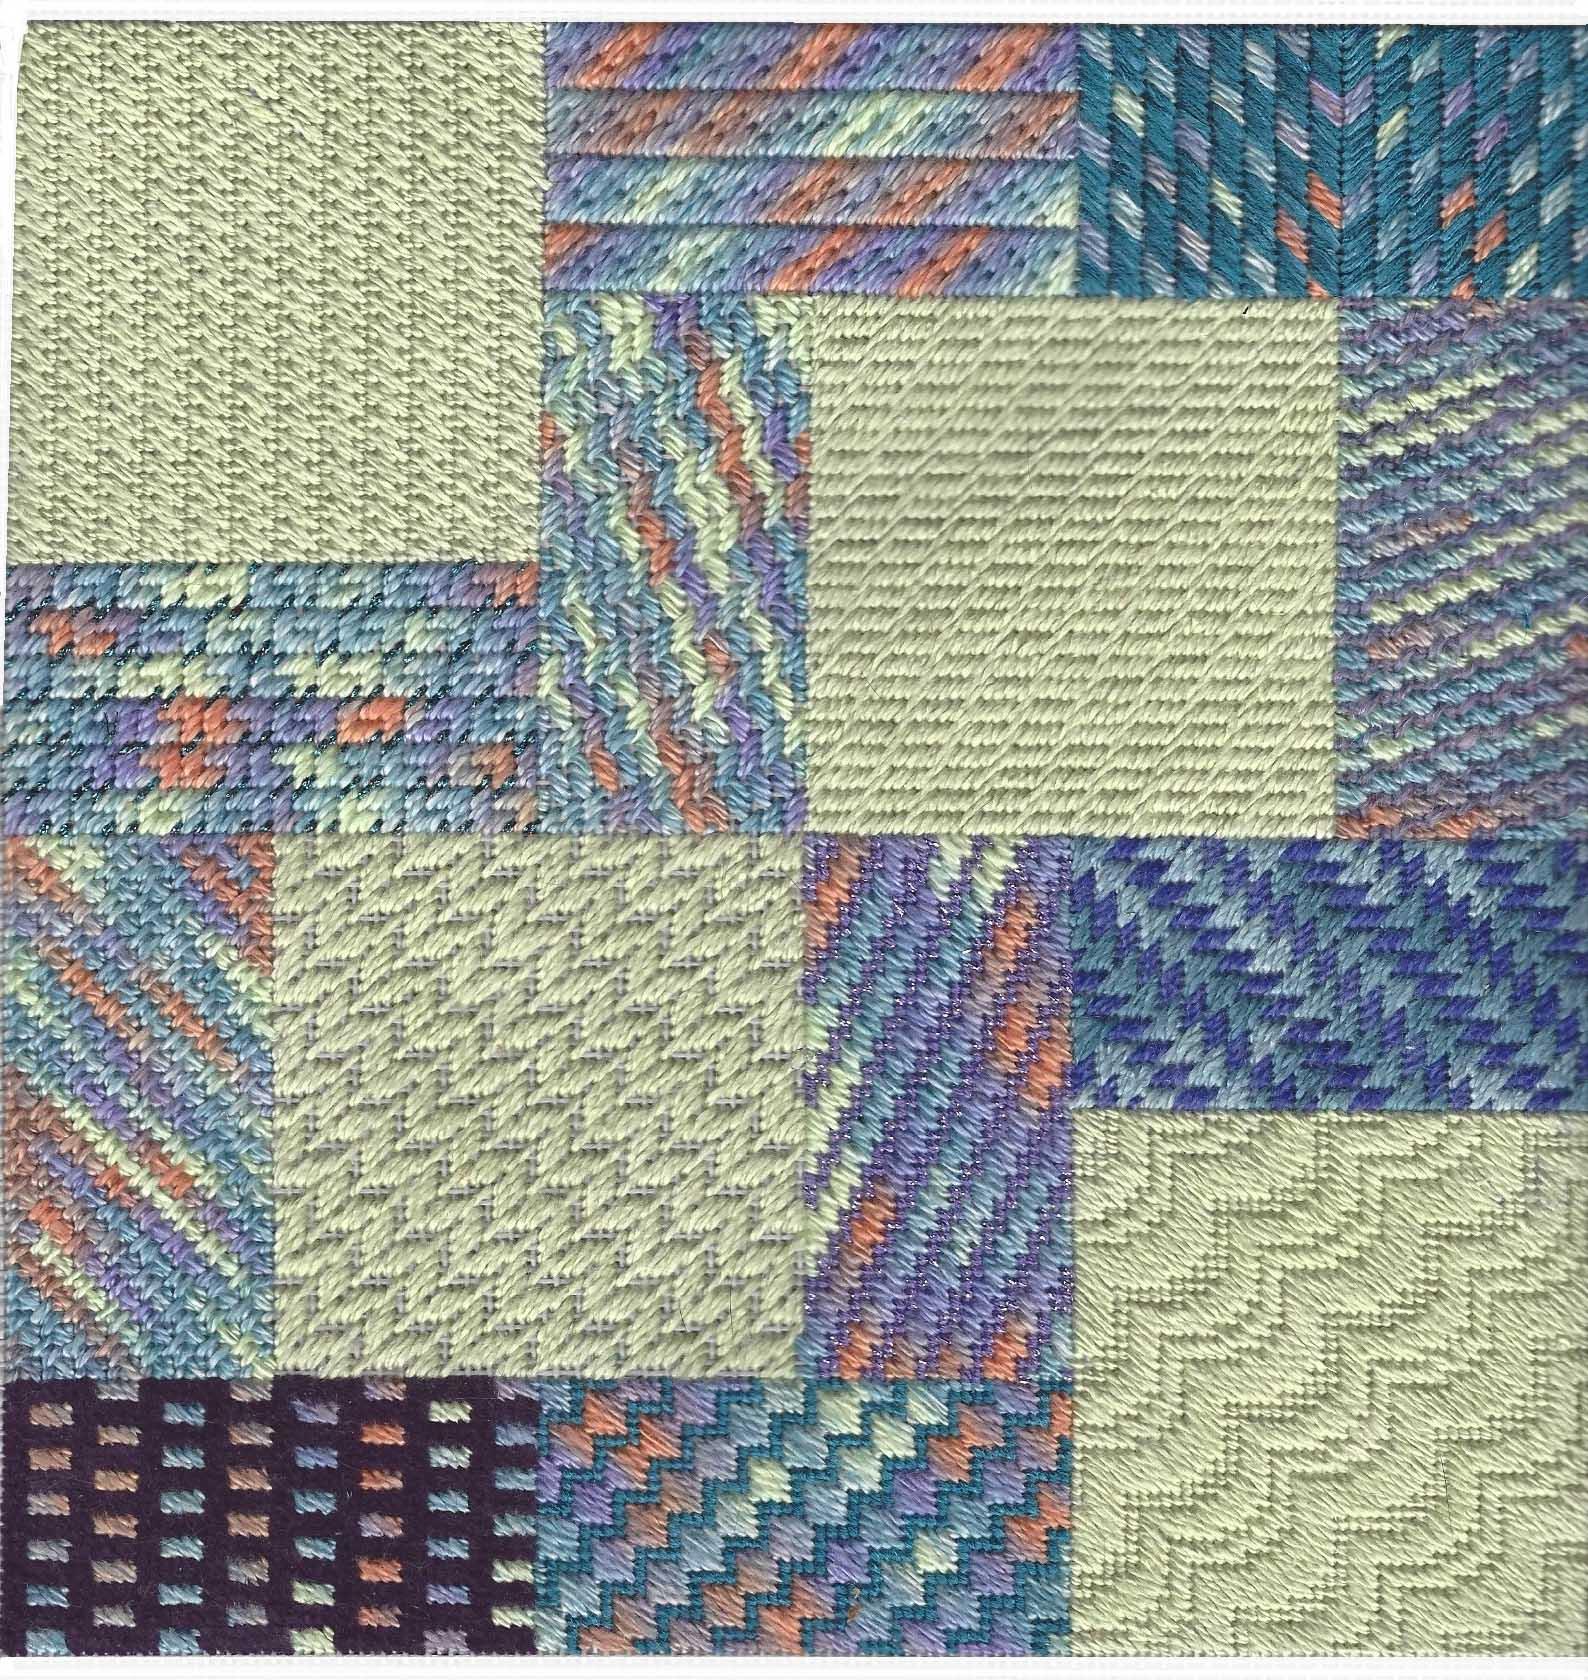 25 Diagonal Stitches needlepoint sampler